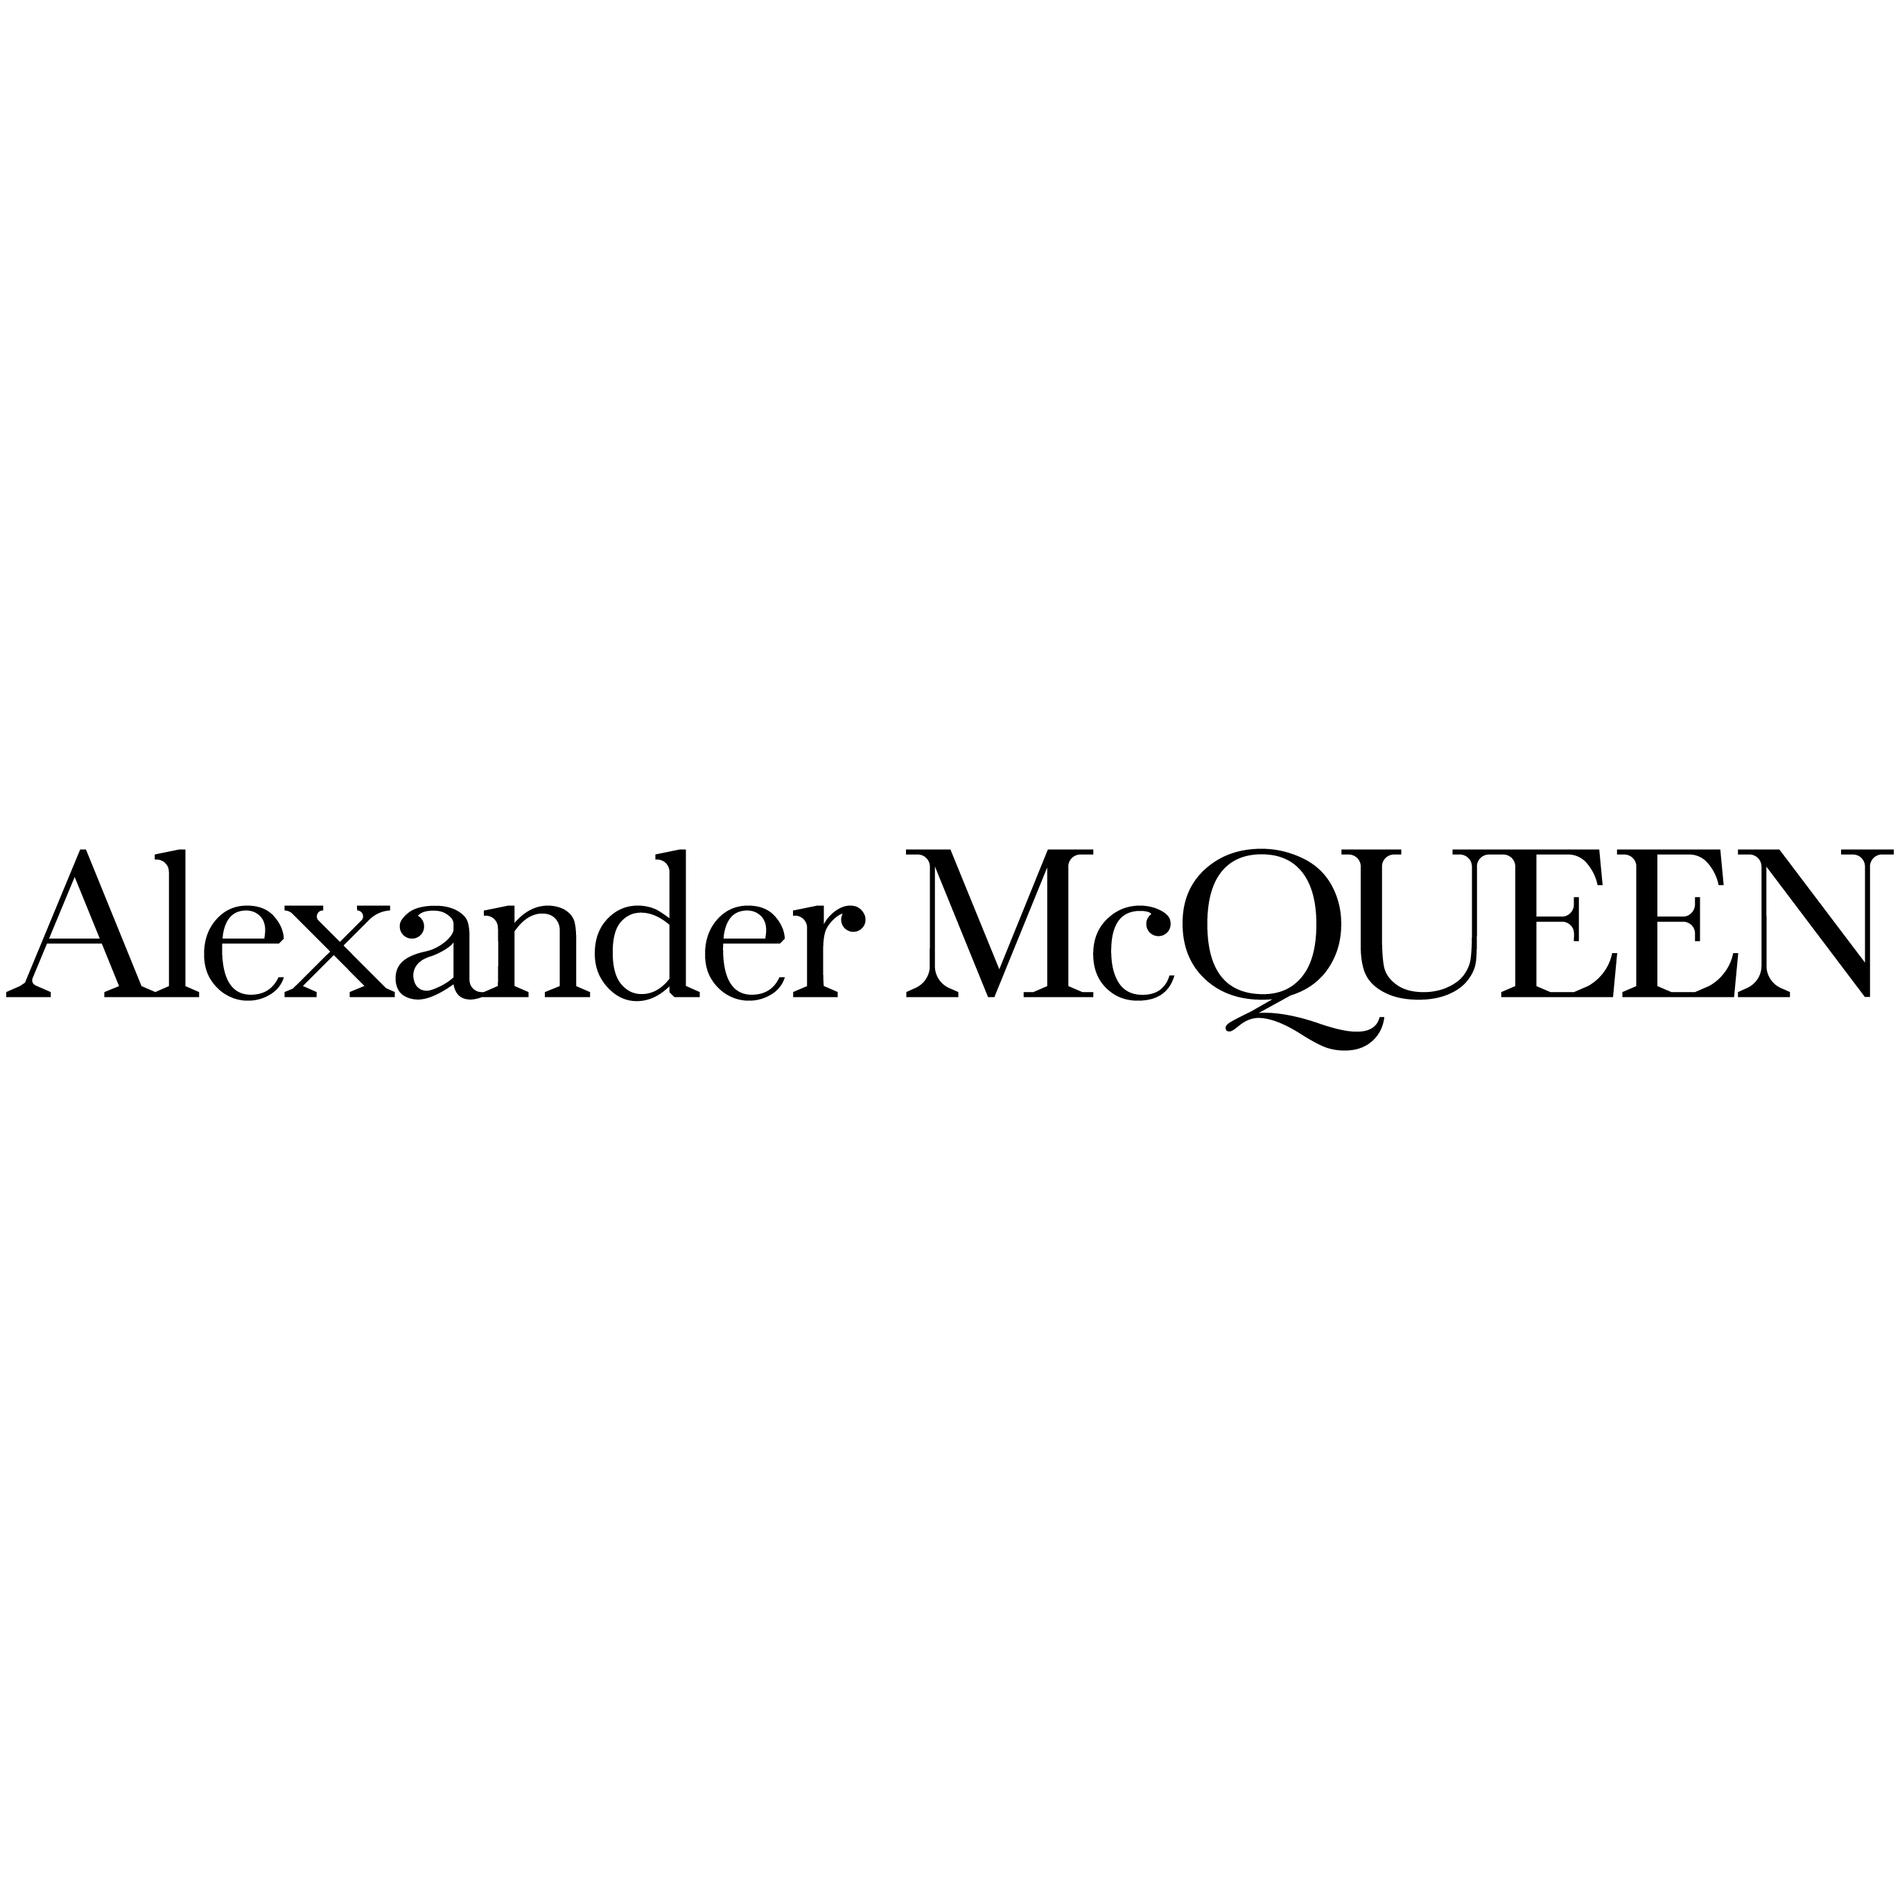 Alexander McQueen - London, London SW1X 7XL - 020 7730 1234 | ShowMeLocal.com